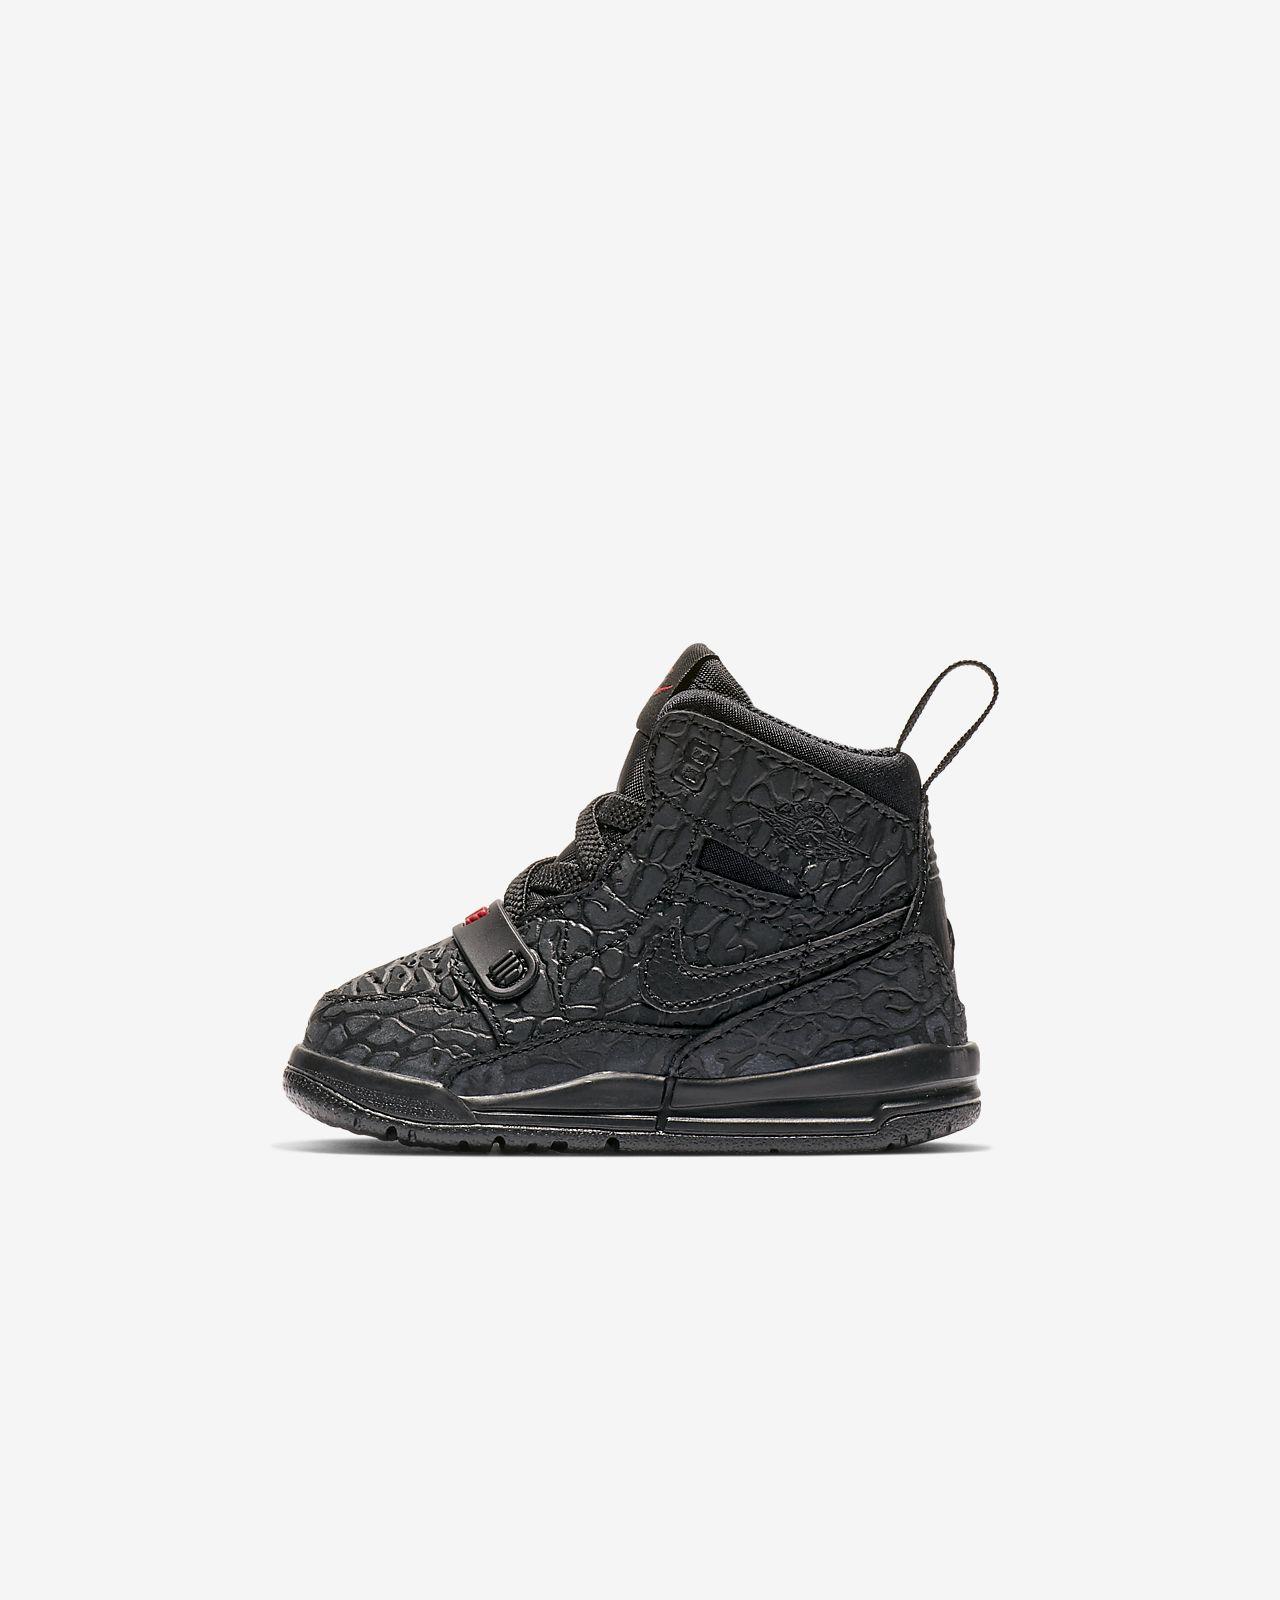 save off 18c68 4d31c ... Air Jordan Legacy 312-sko til babyersmå børn